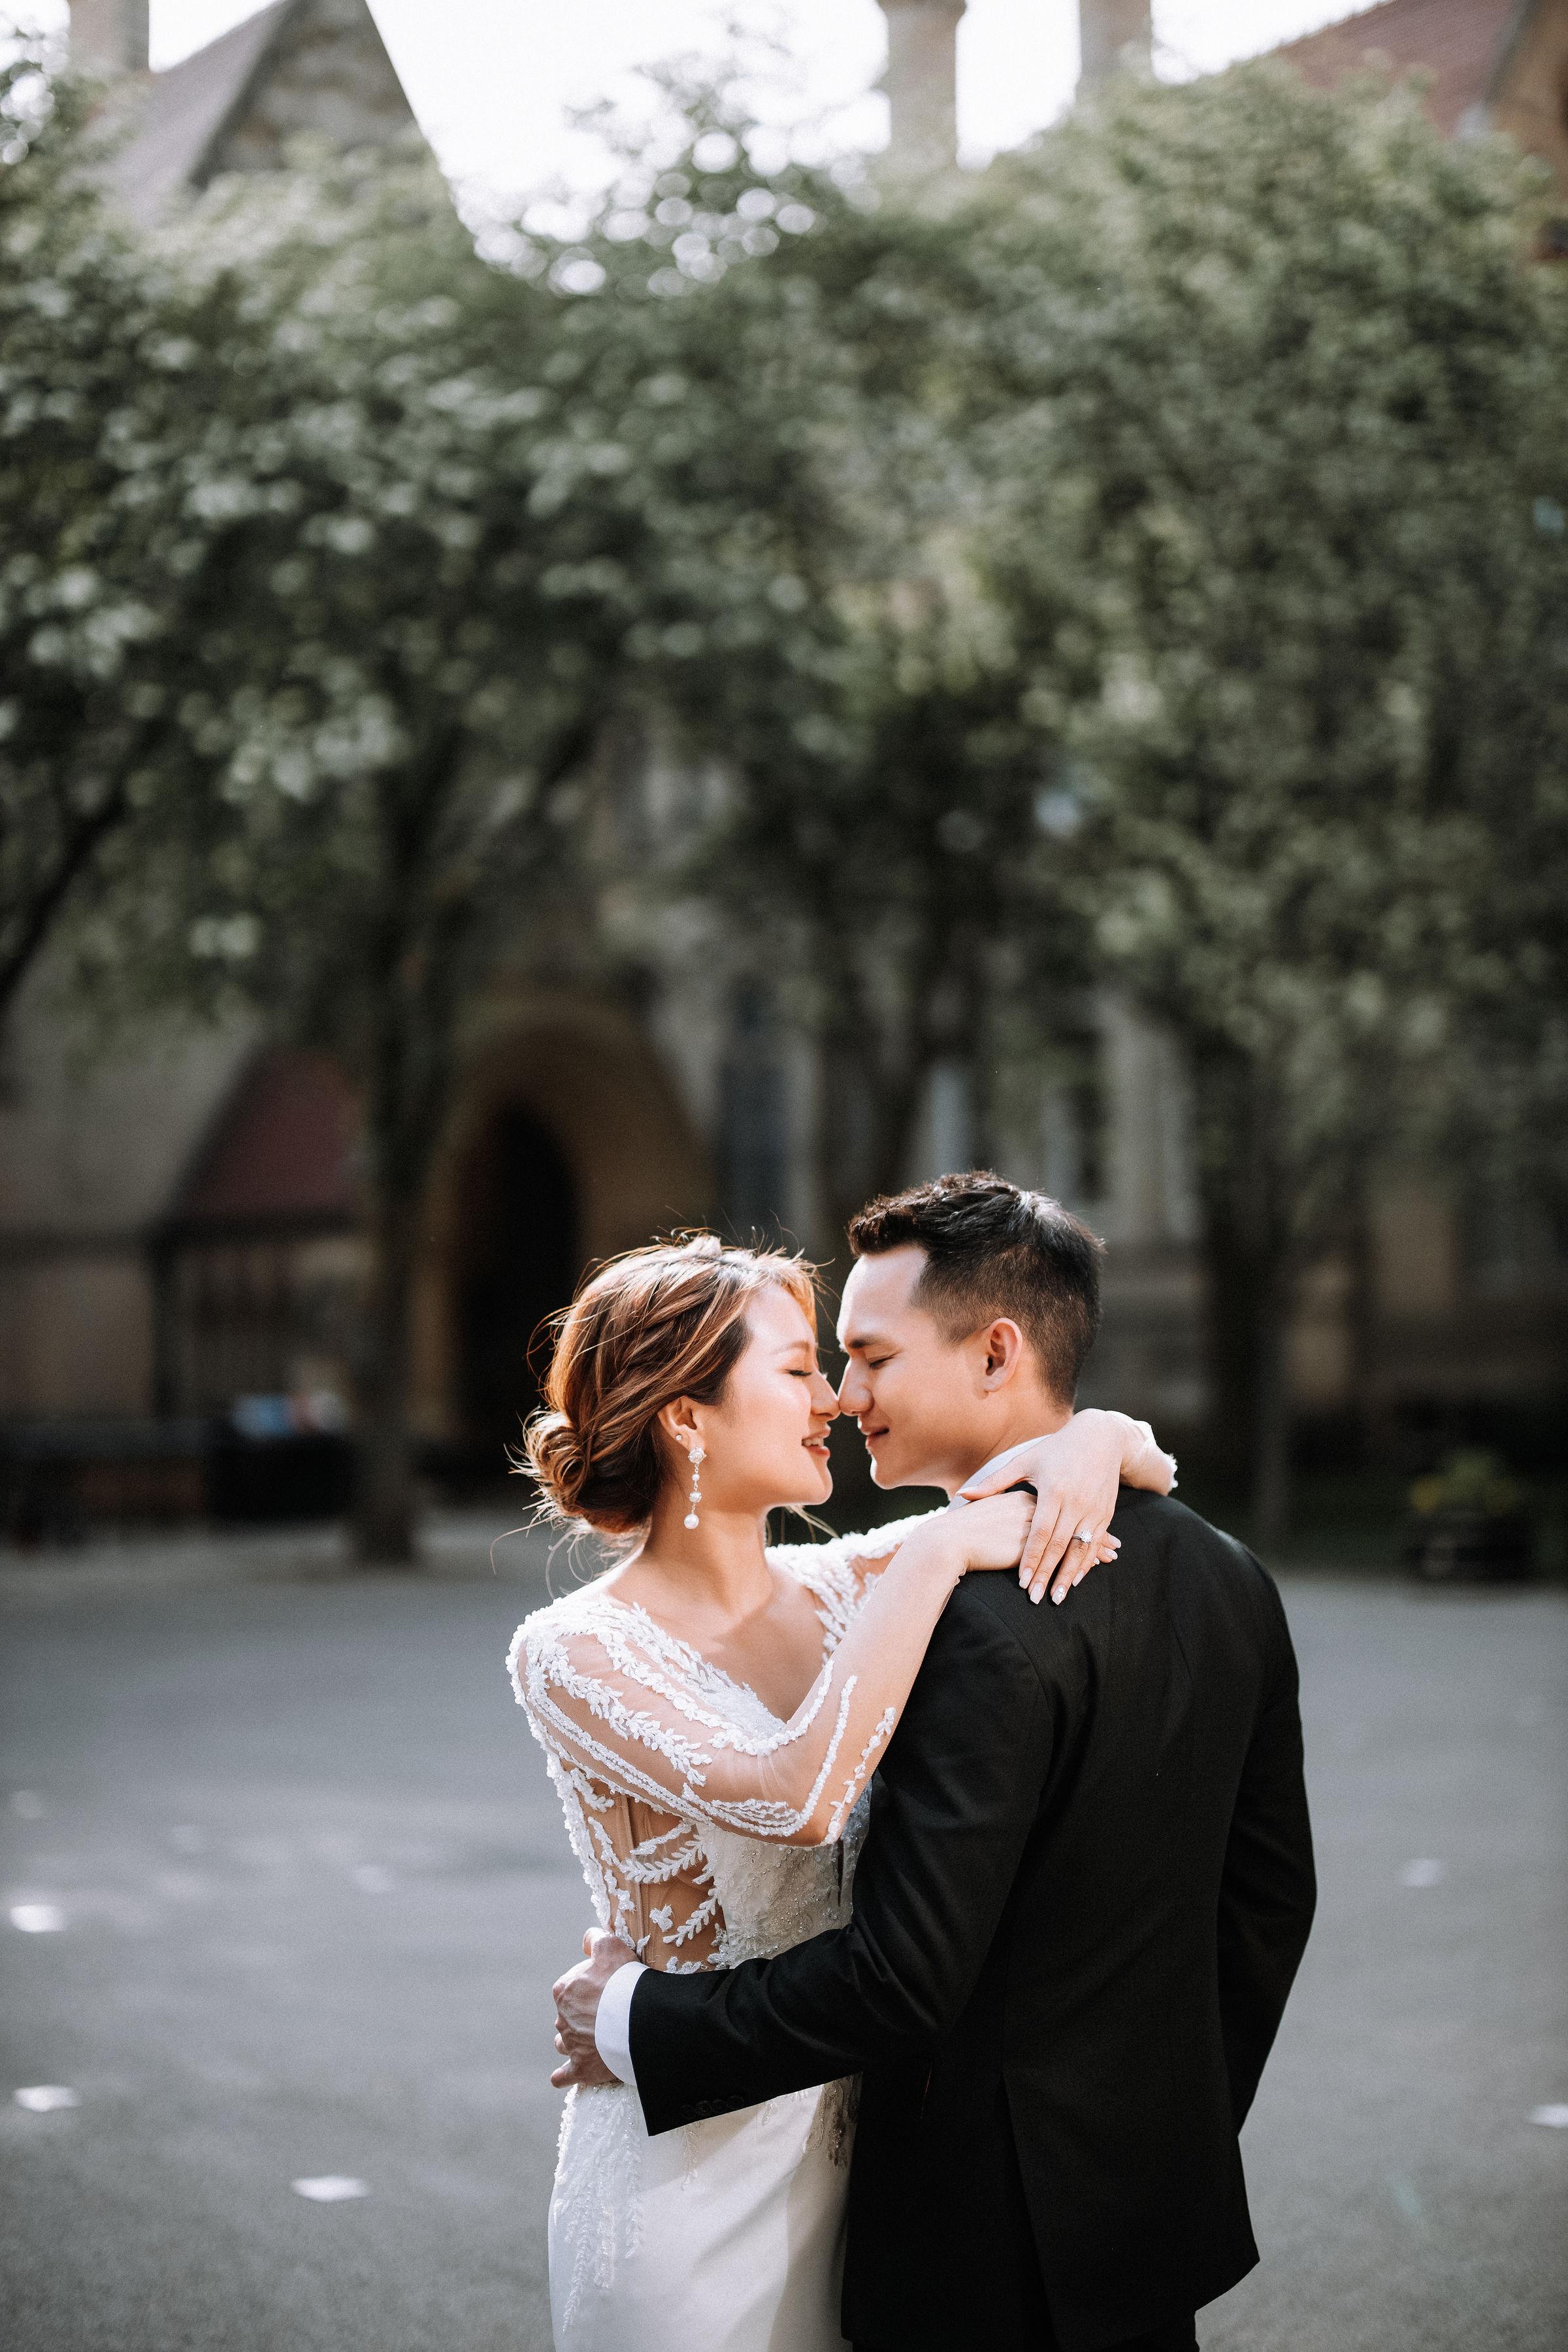 bespoke+lace+long+sleeve+wedding+gown+ccm.jpg